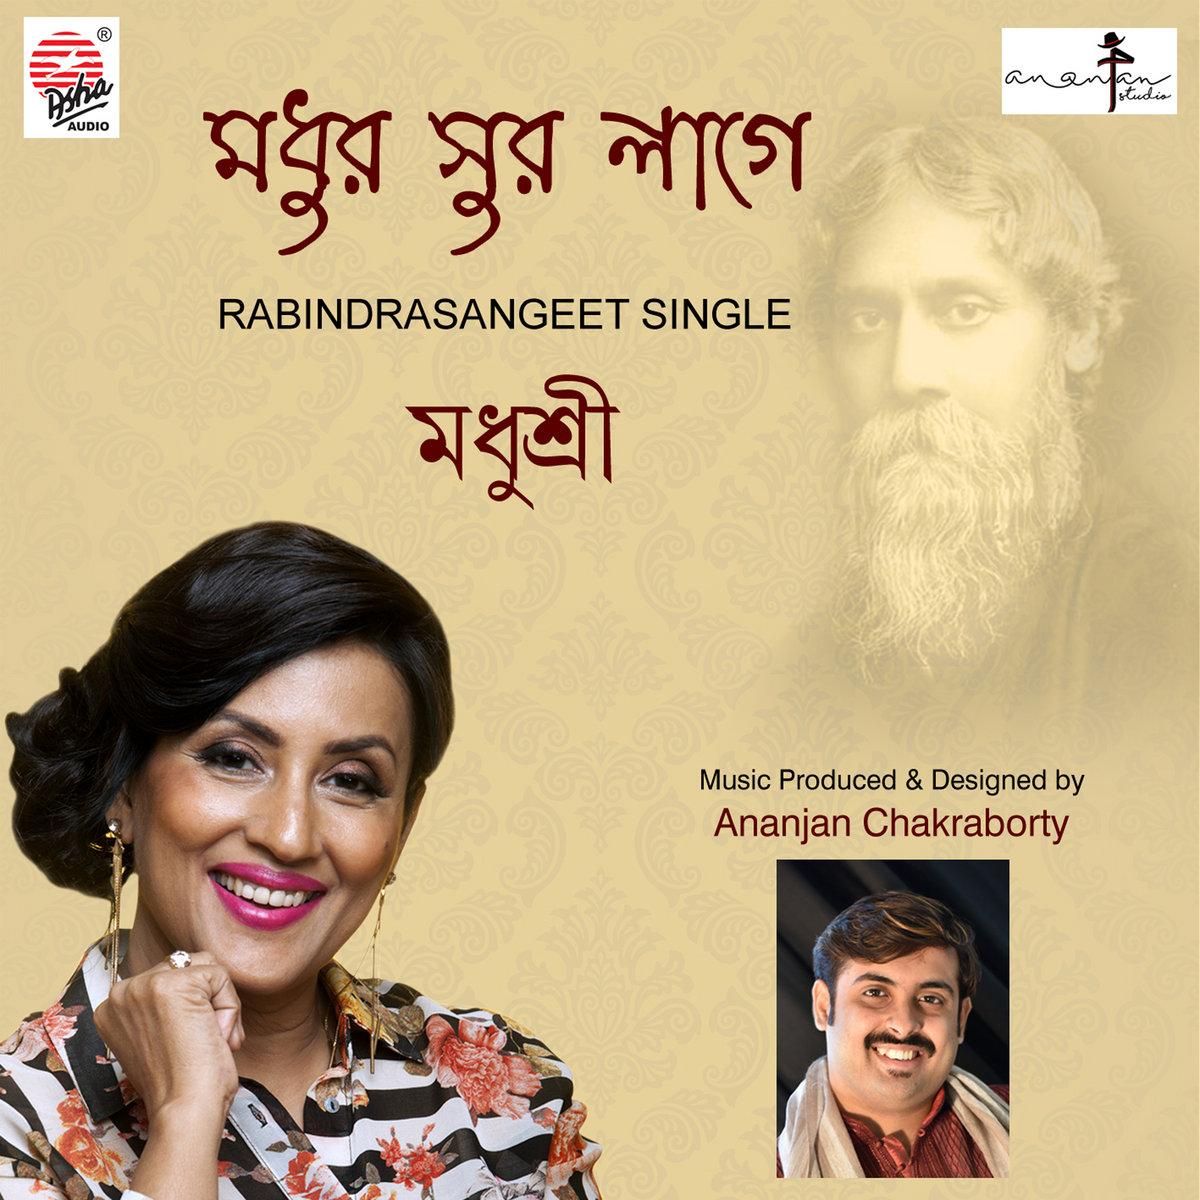 Kaun hai jo sapno mein aaya full movie hindi dubbed free download kaun hai jo sapno mein aaya full movie hindi dubbed free download ccuart Gallery